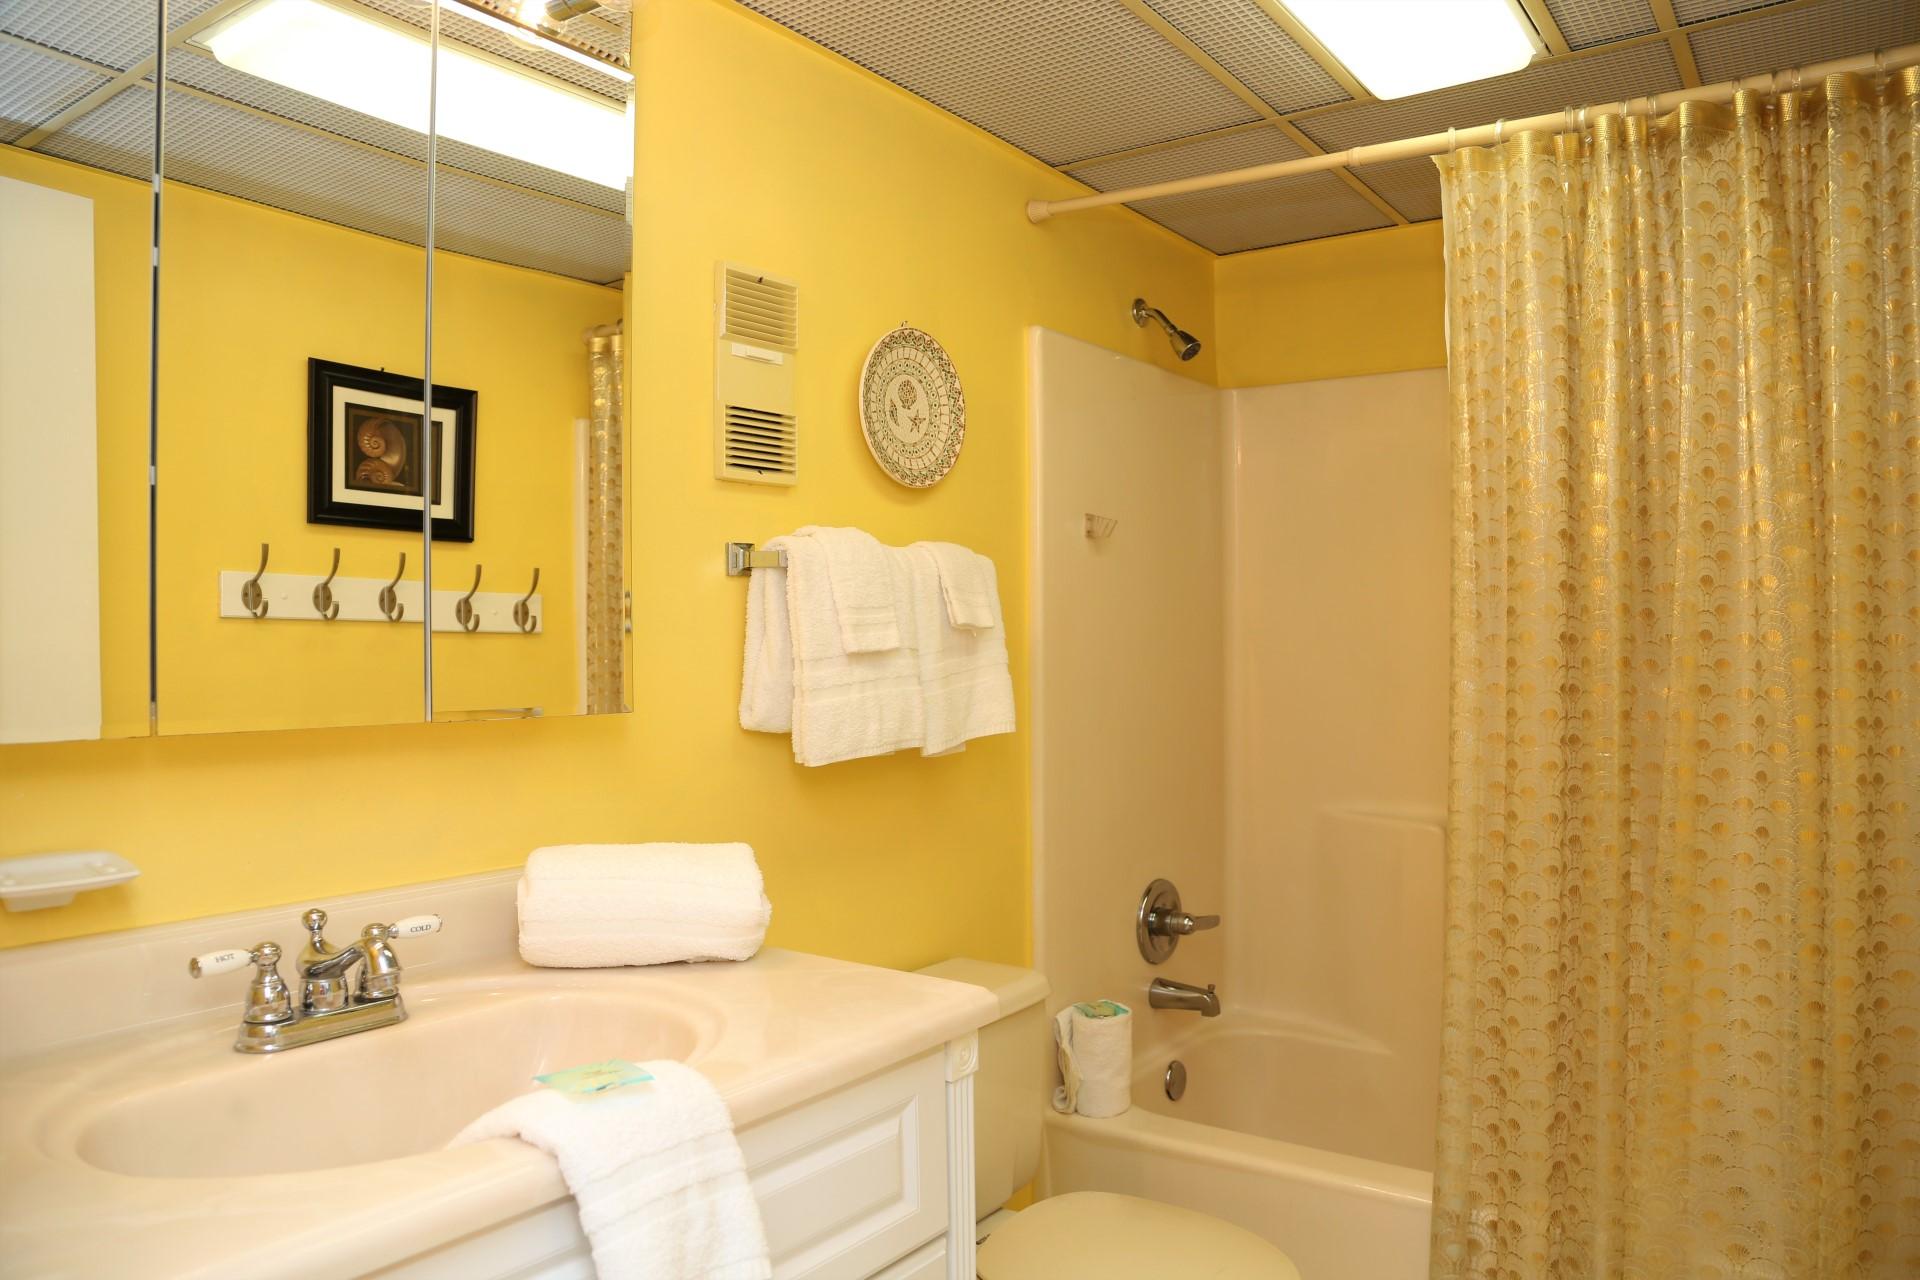 Master bathroom includes shower/tub combo.